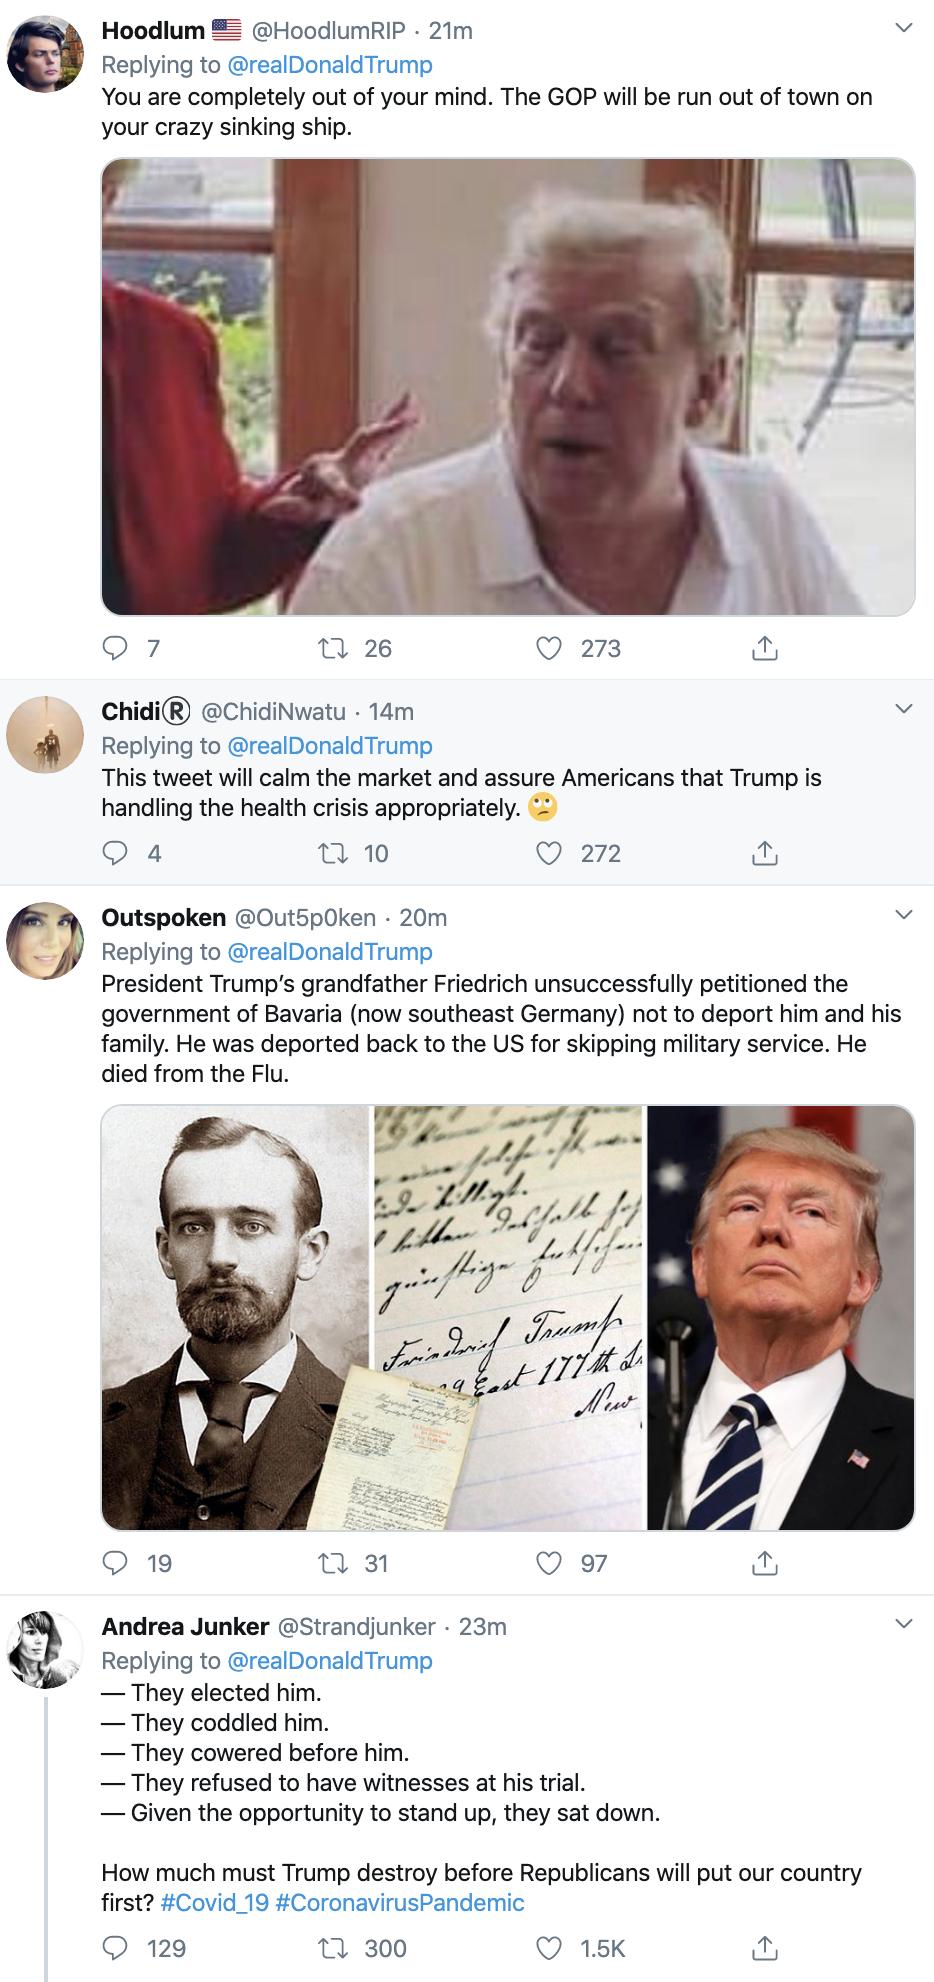 Screen-Shot-2020-03-12-at-10.08.30-AM Trump Goes After GOP Senators On Twitter Thursday Activism Featured Politics Top Stories